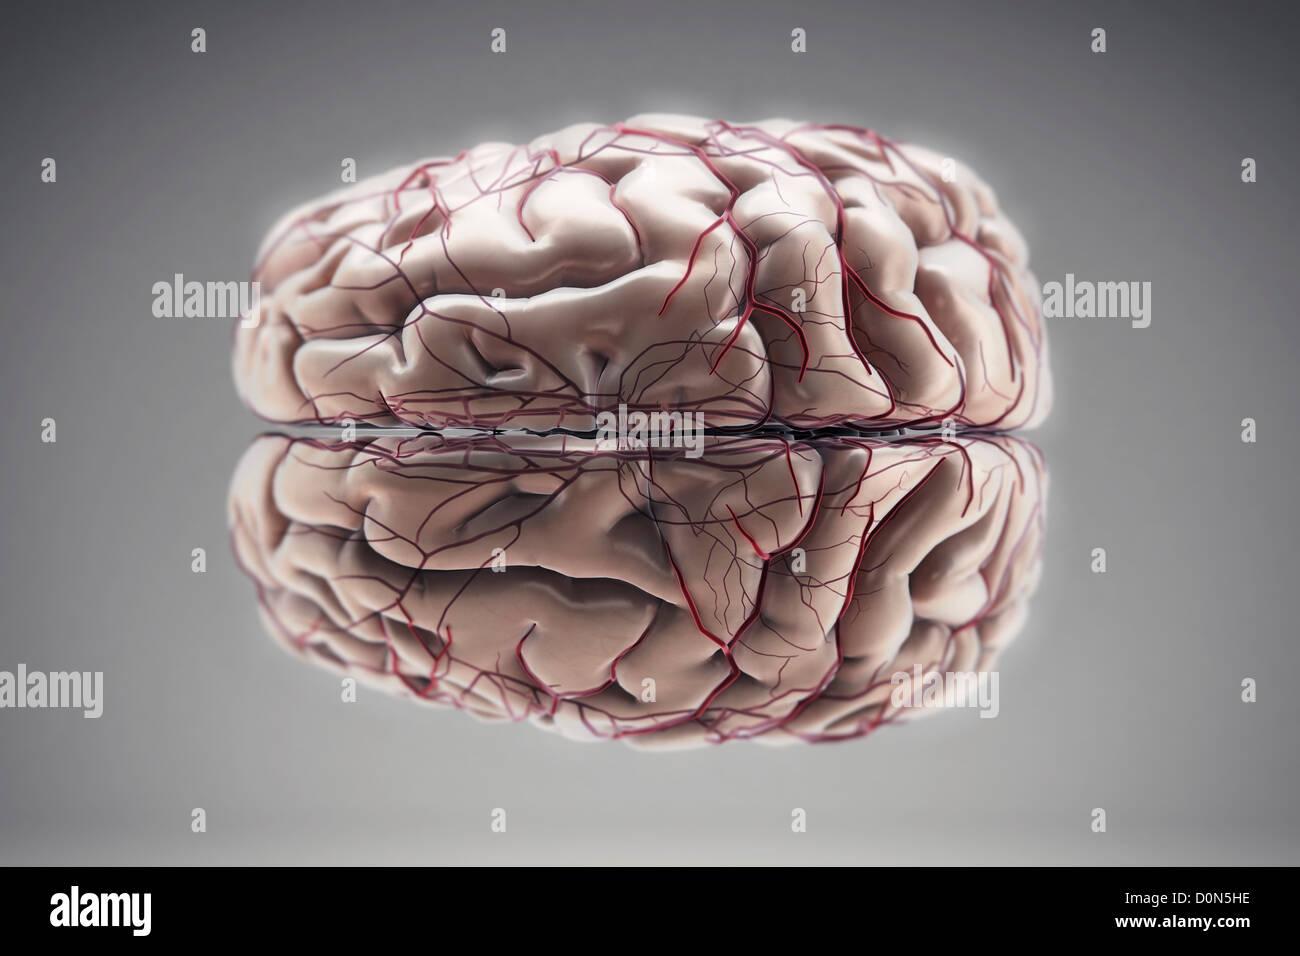 Longitudinal Cerebral Fissure Imágenes De Stock & Longitudinal ...